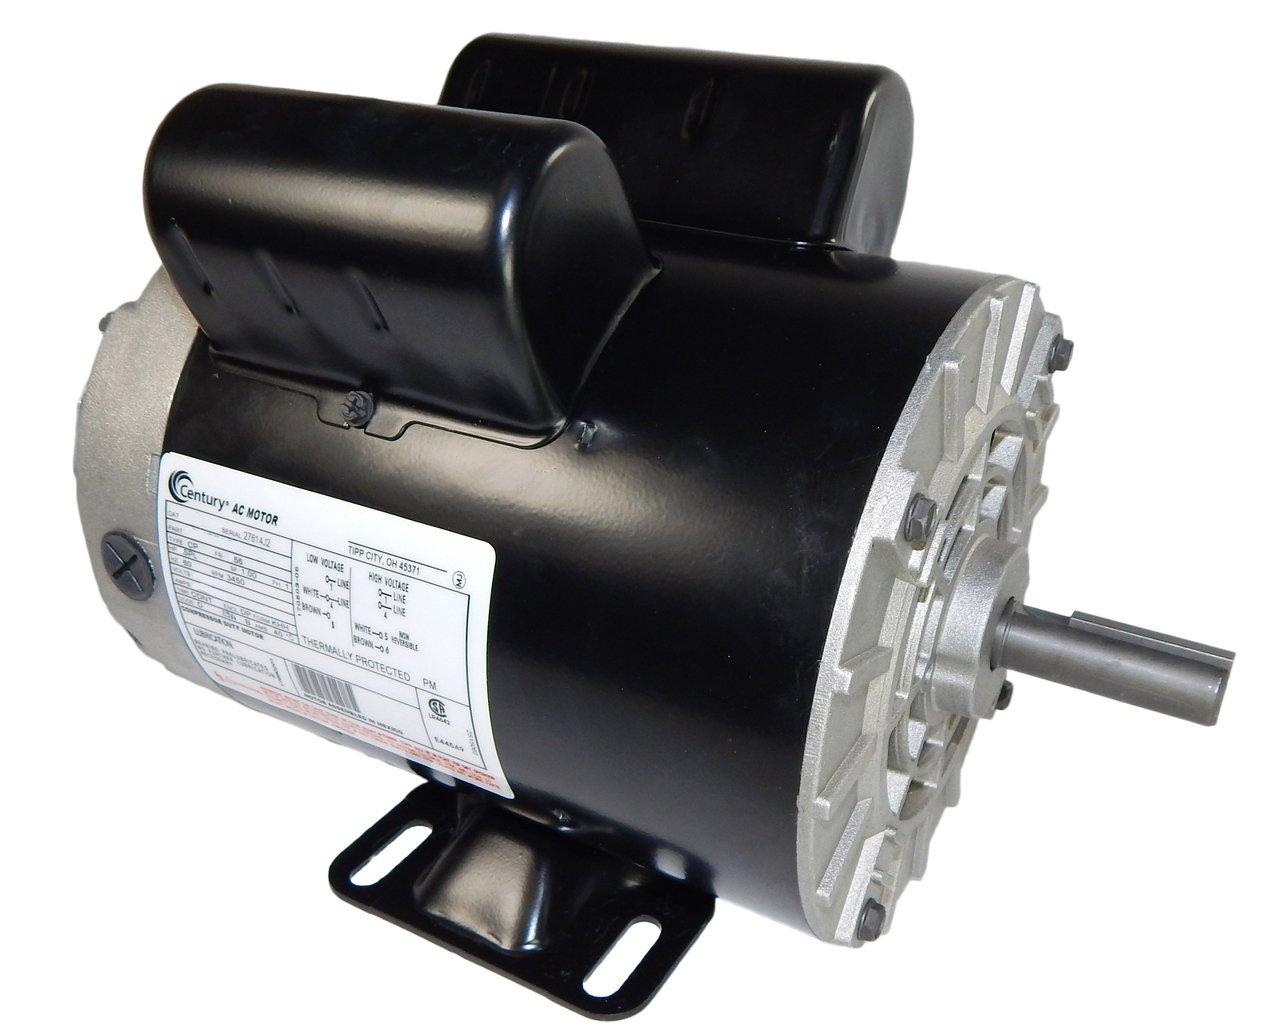 Cheap 5hp Compressor Motor, find 5hp Compressor Motor deals on line